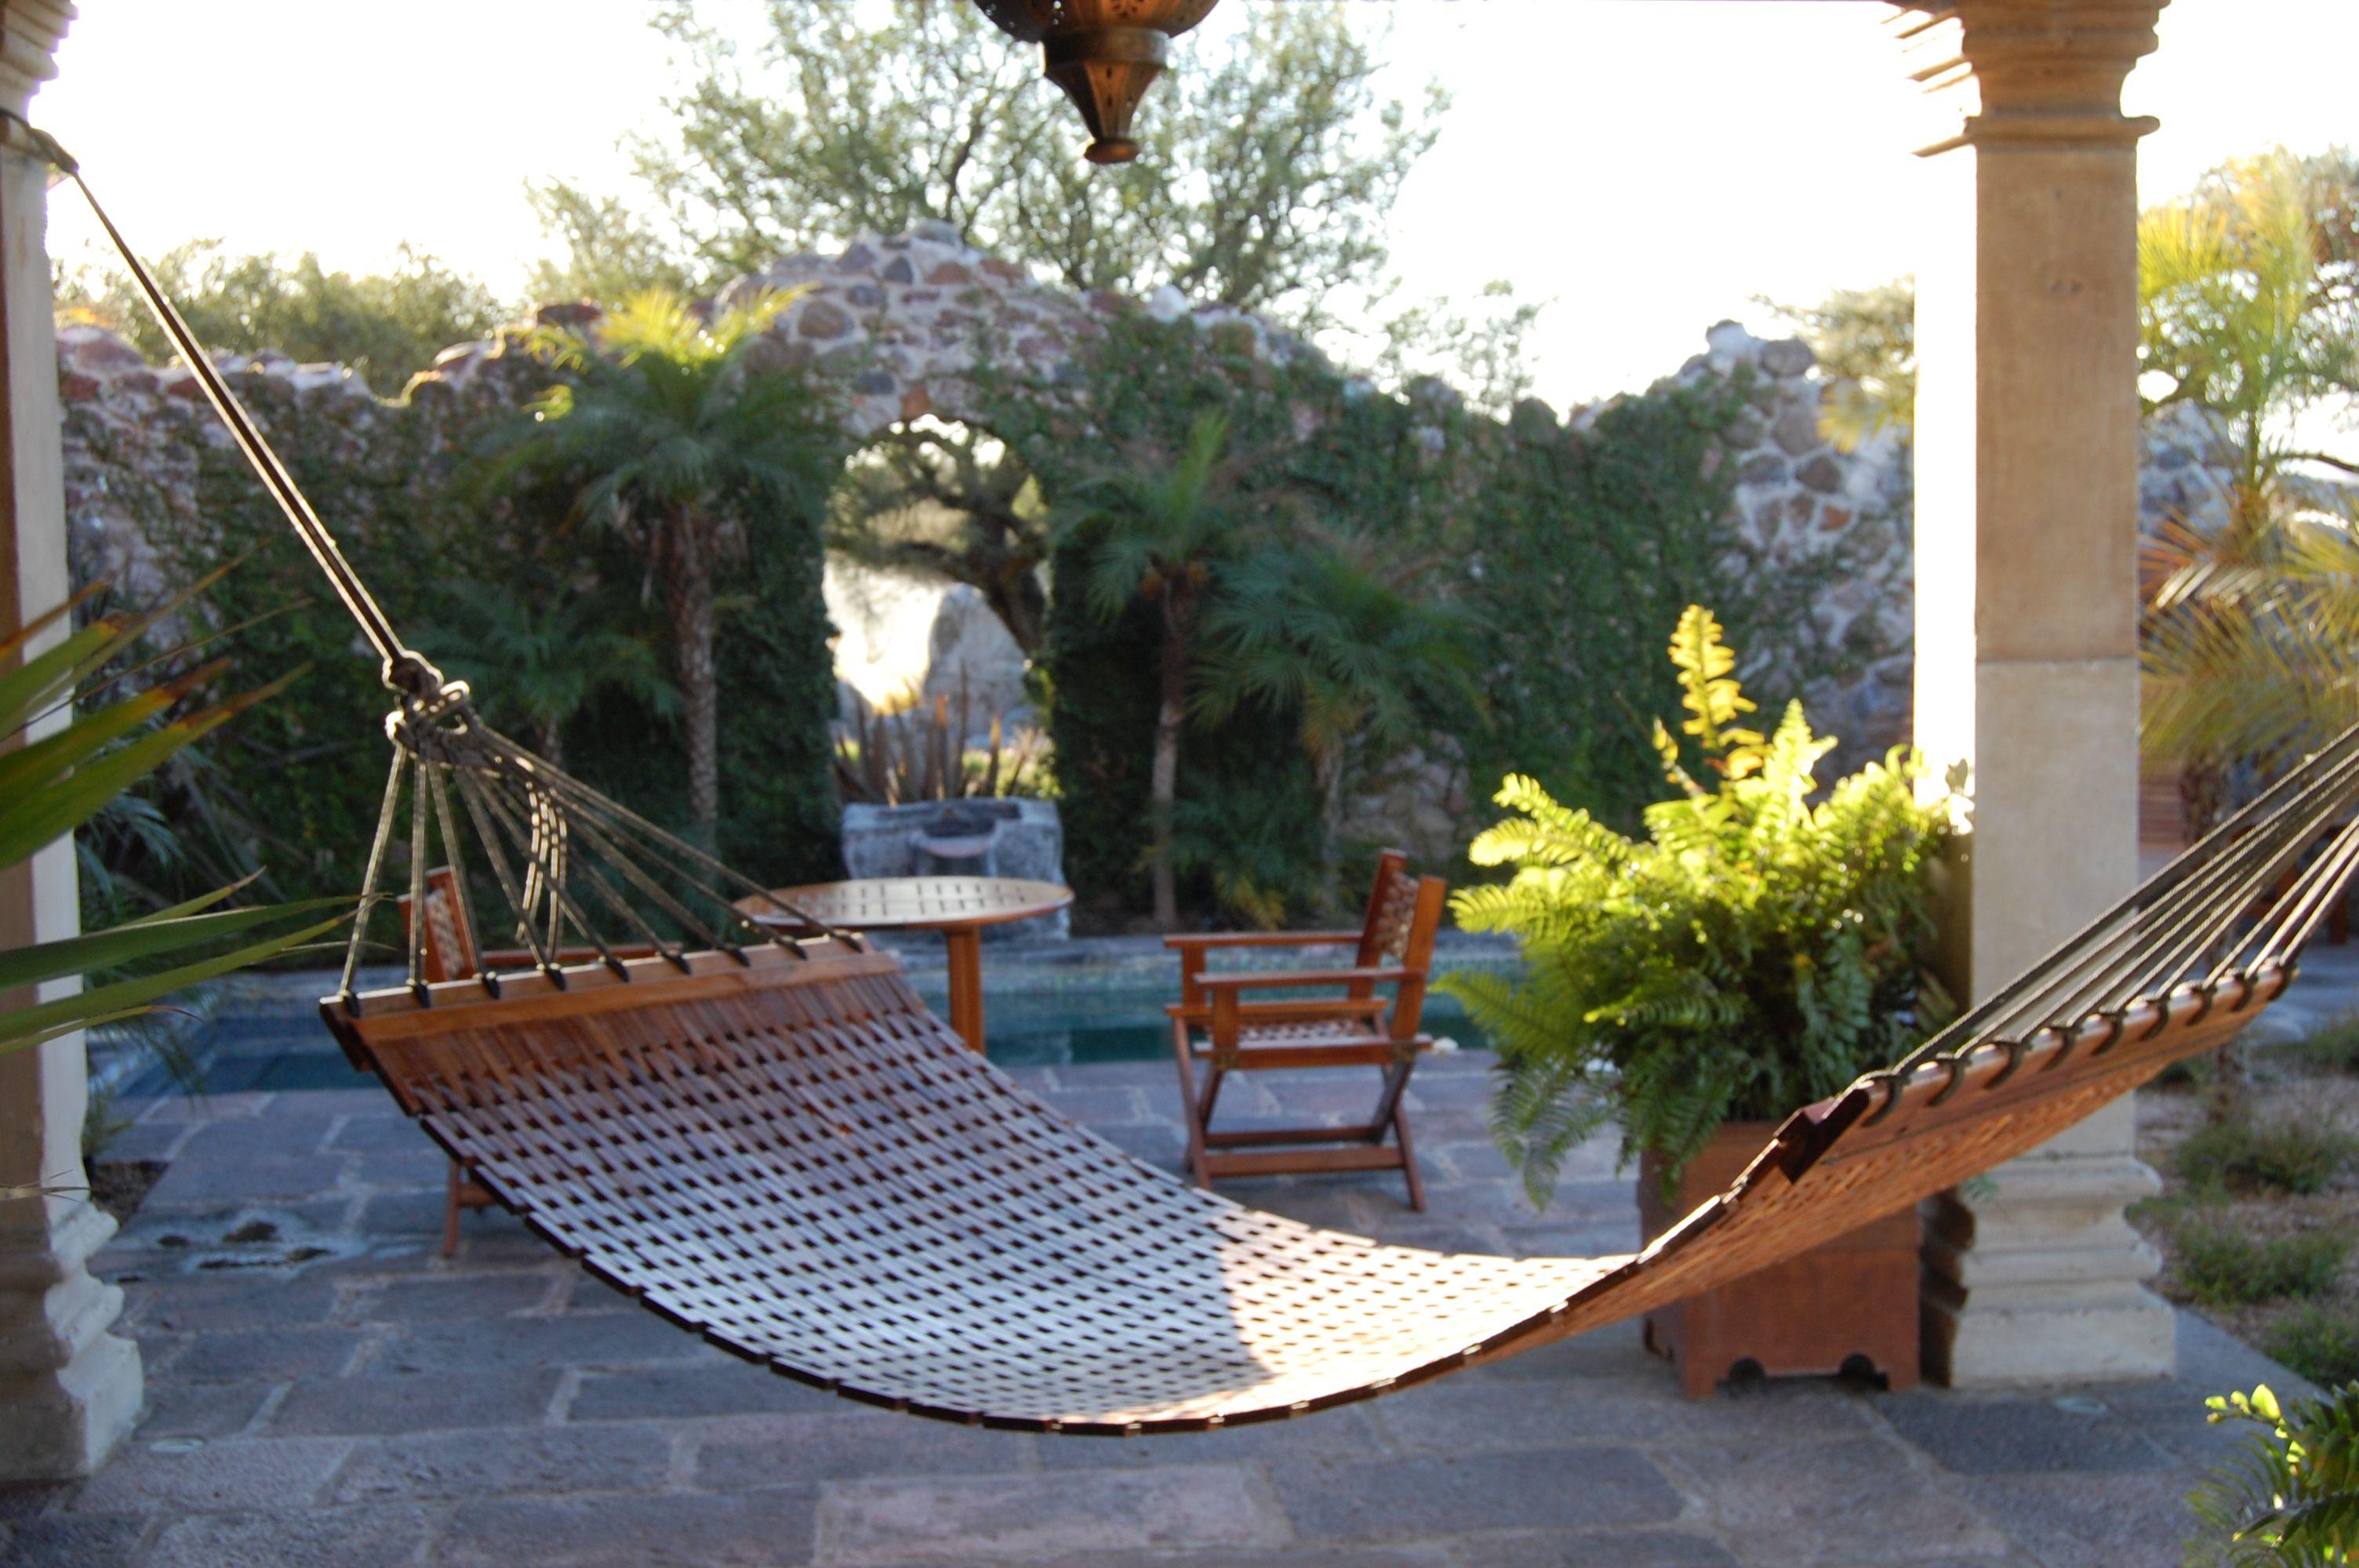 brazilian standing free metal small ft adjustable short dfohome h hammock xx hammocks stand